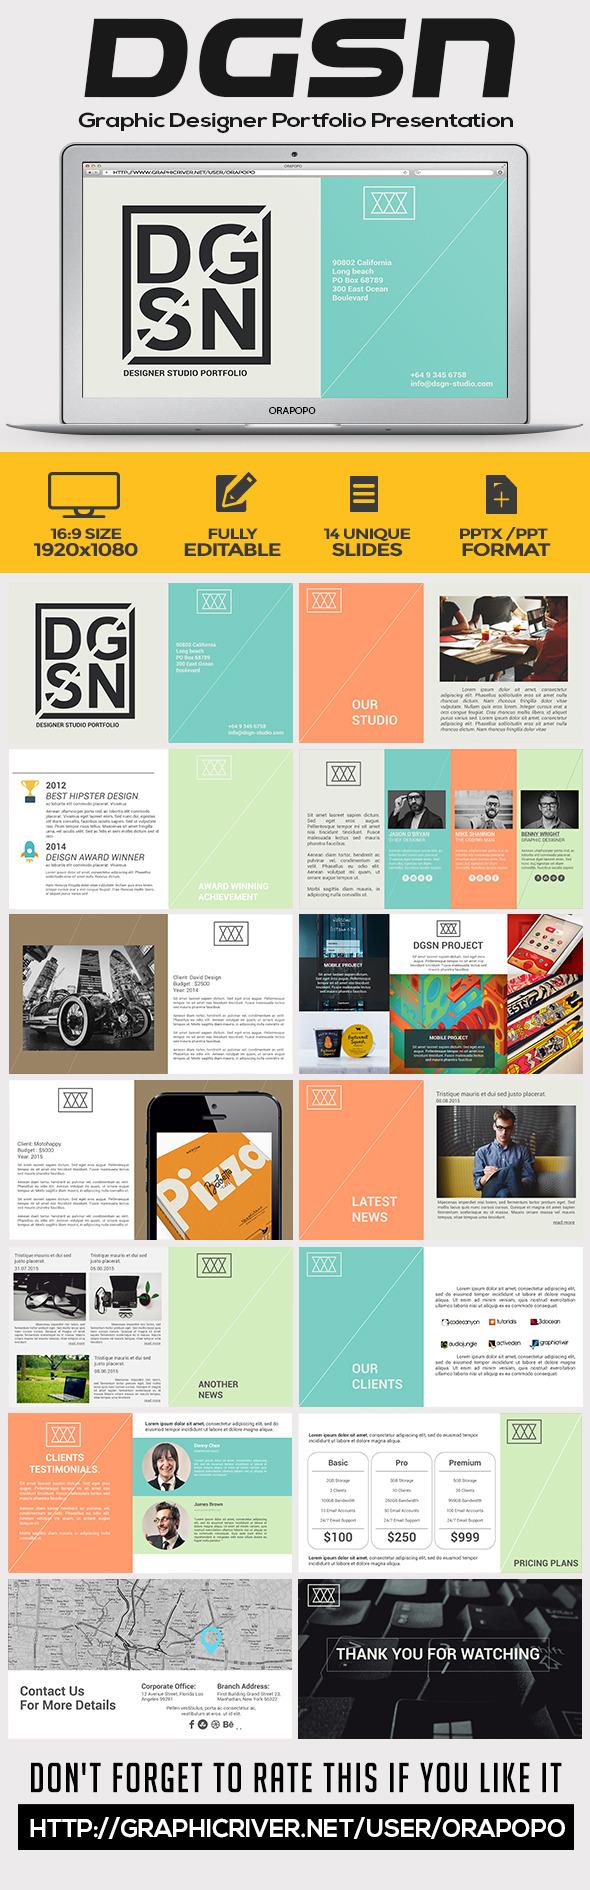 Graphic Design Portfolio Presentation Graphics, Designs